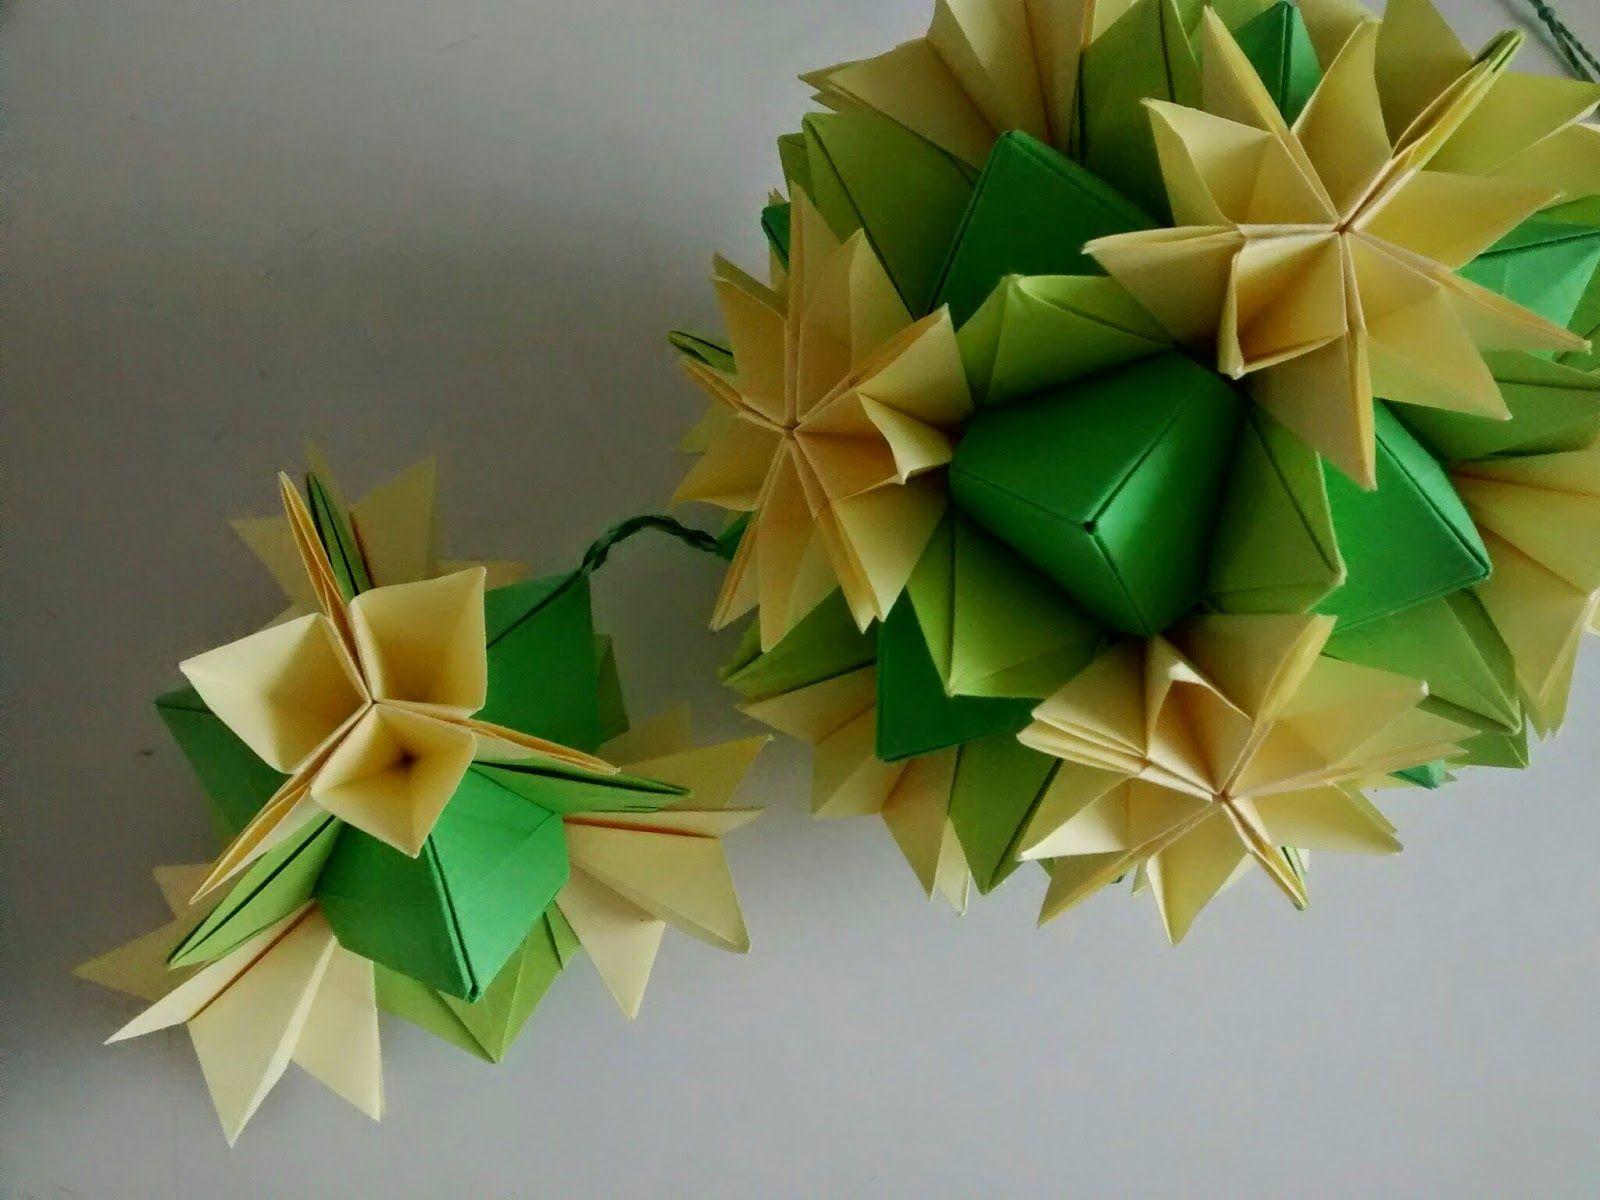 50 Cool Shine Matte Matelic Korean Origami Lucky Stars a.k.a Origami Crane Eggs Frozen